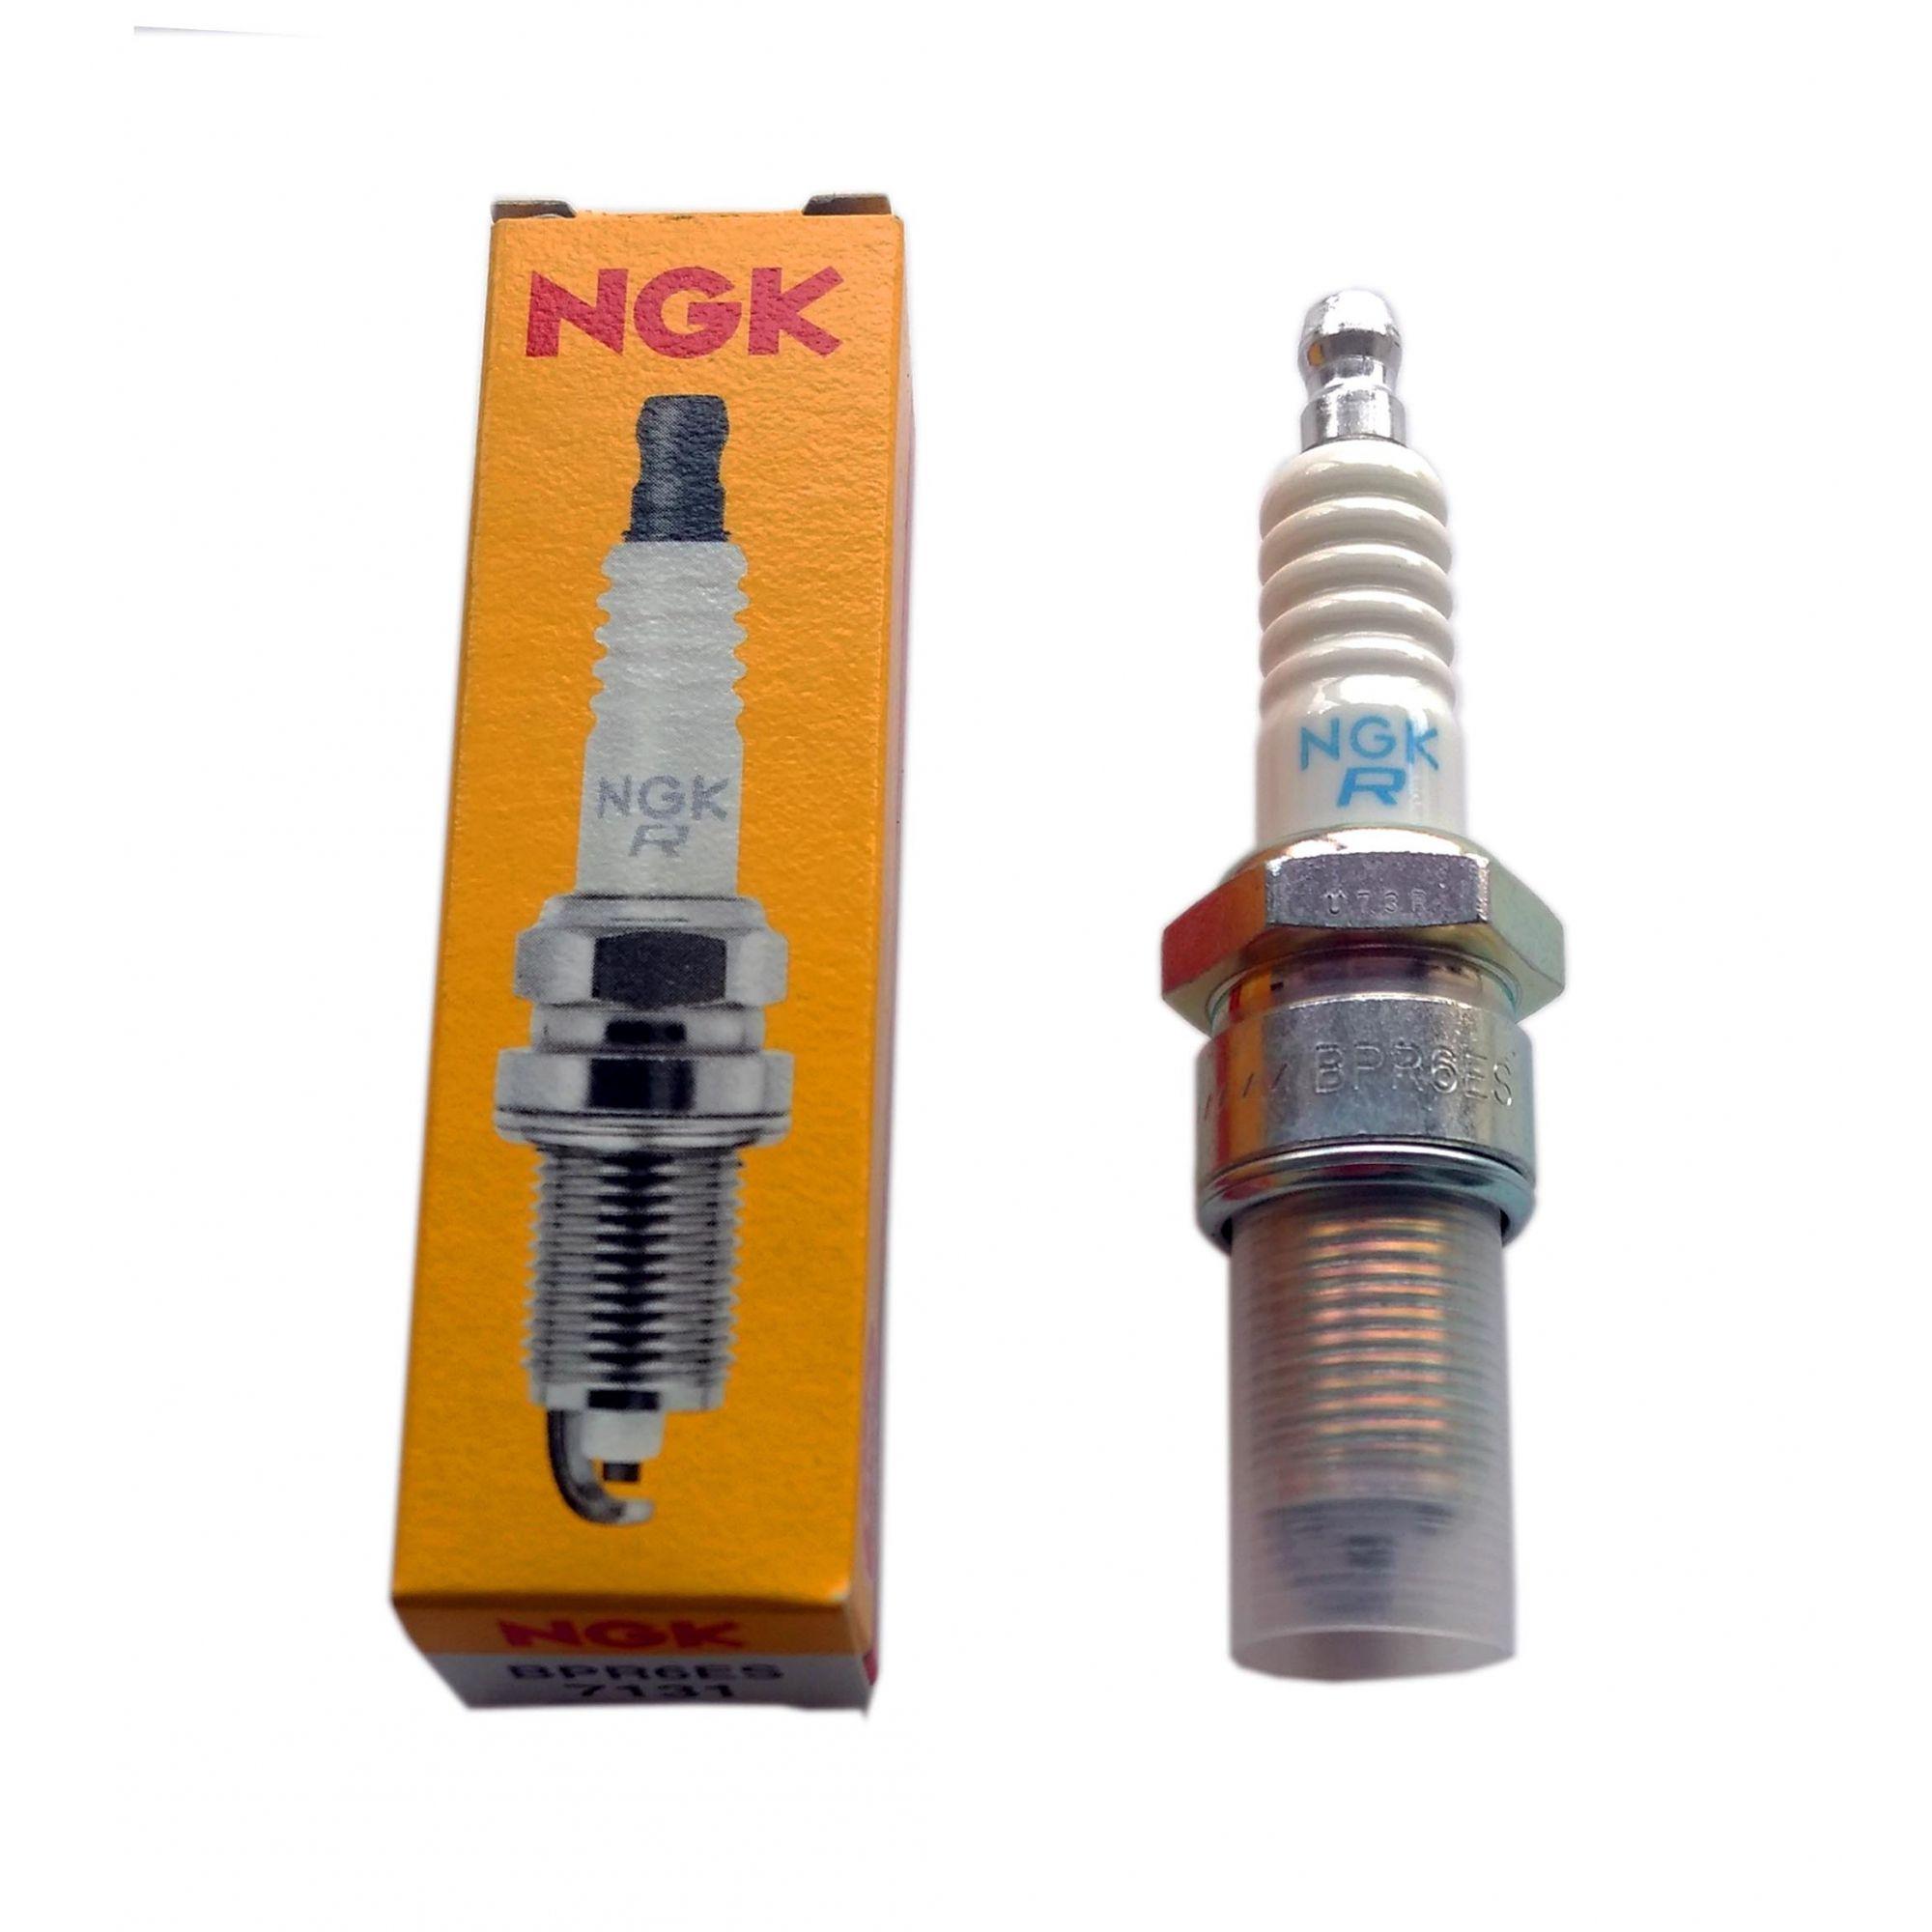 Vela NGK BPR6ES - 5,5-6,5 e 13 HP - 488